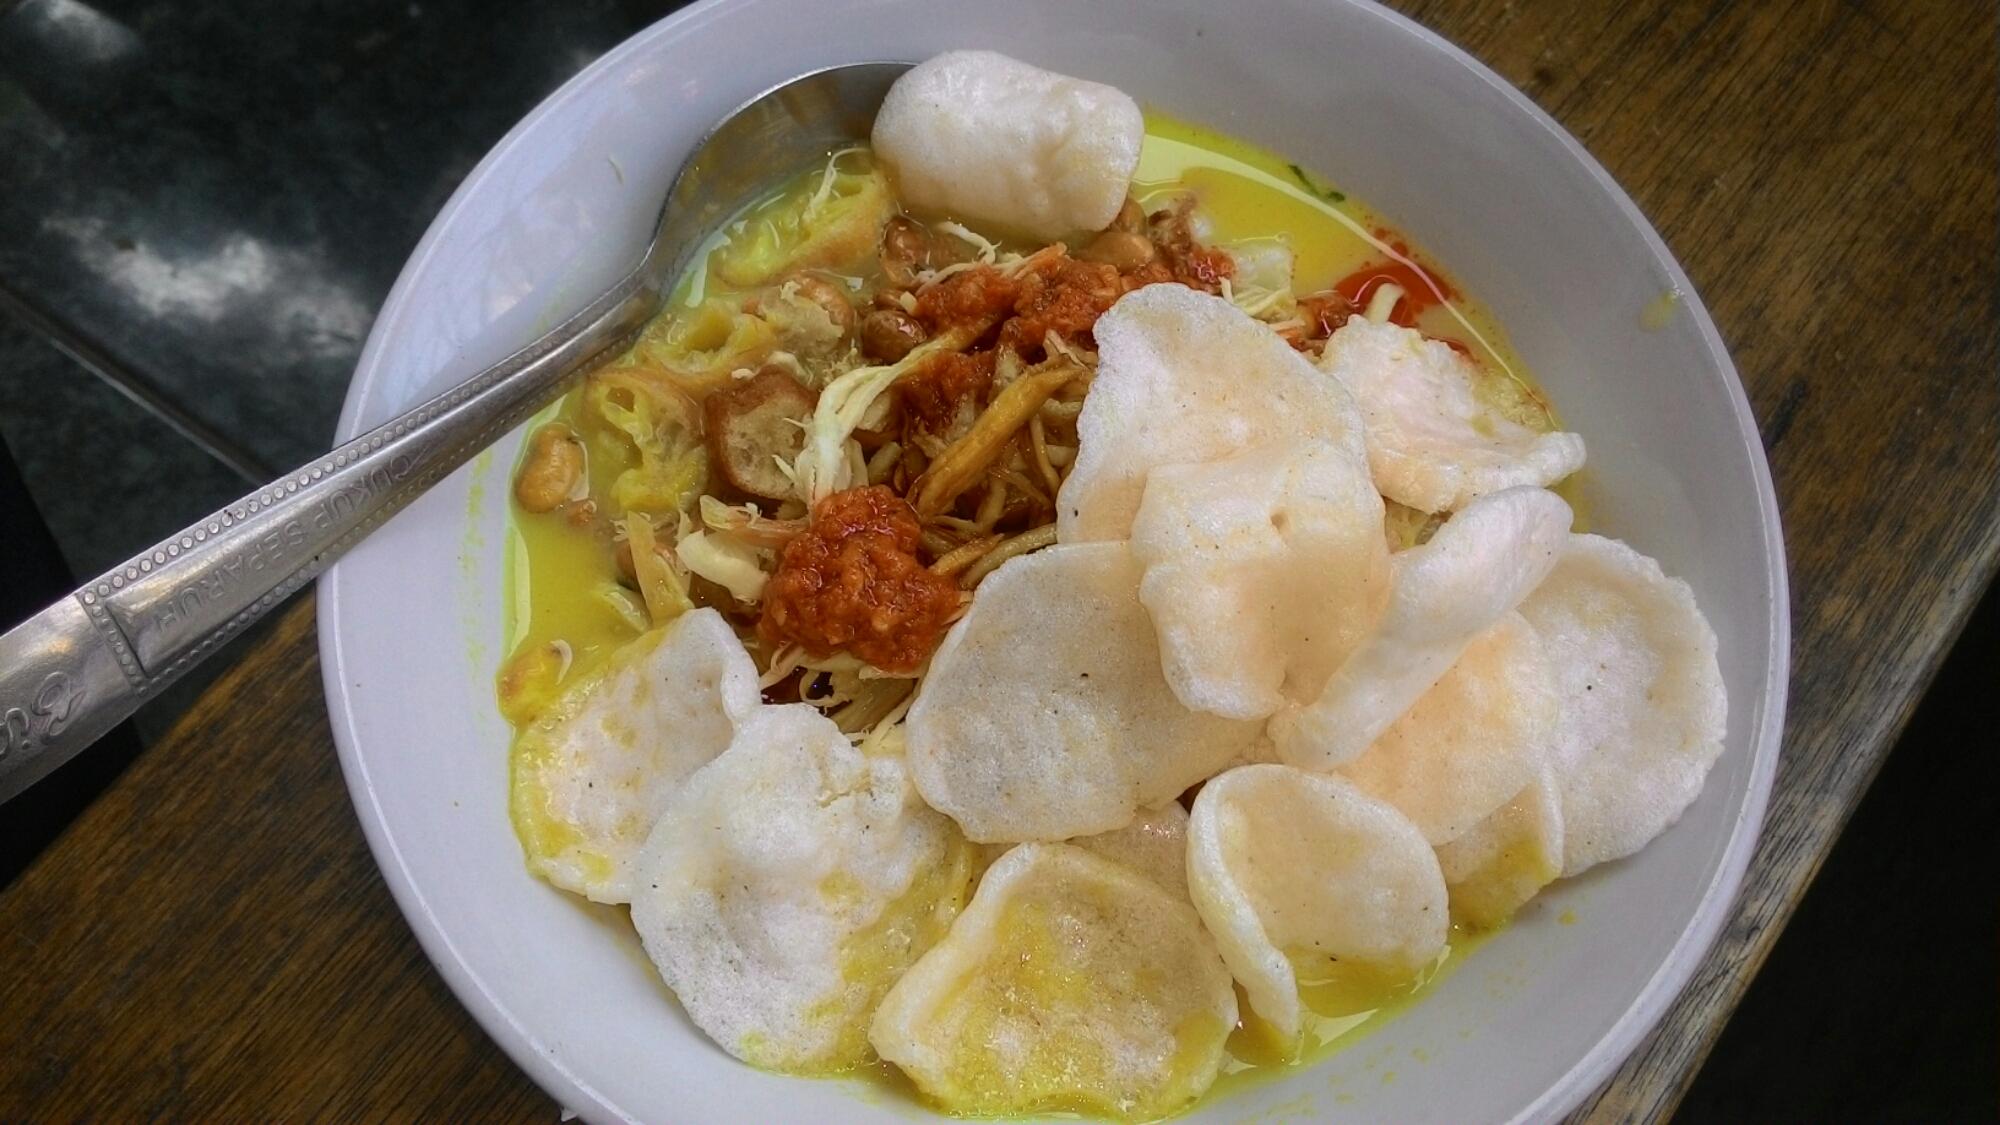 Sarapan Bubur Ayam Di Jl Panarukan Kepanjen Malang WIRO NybaMt